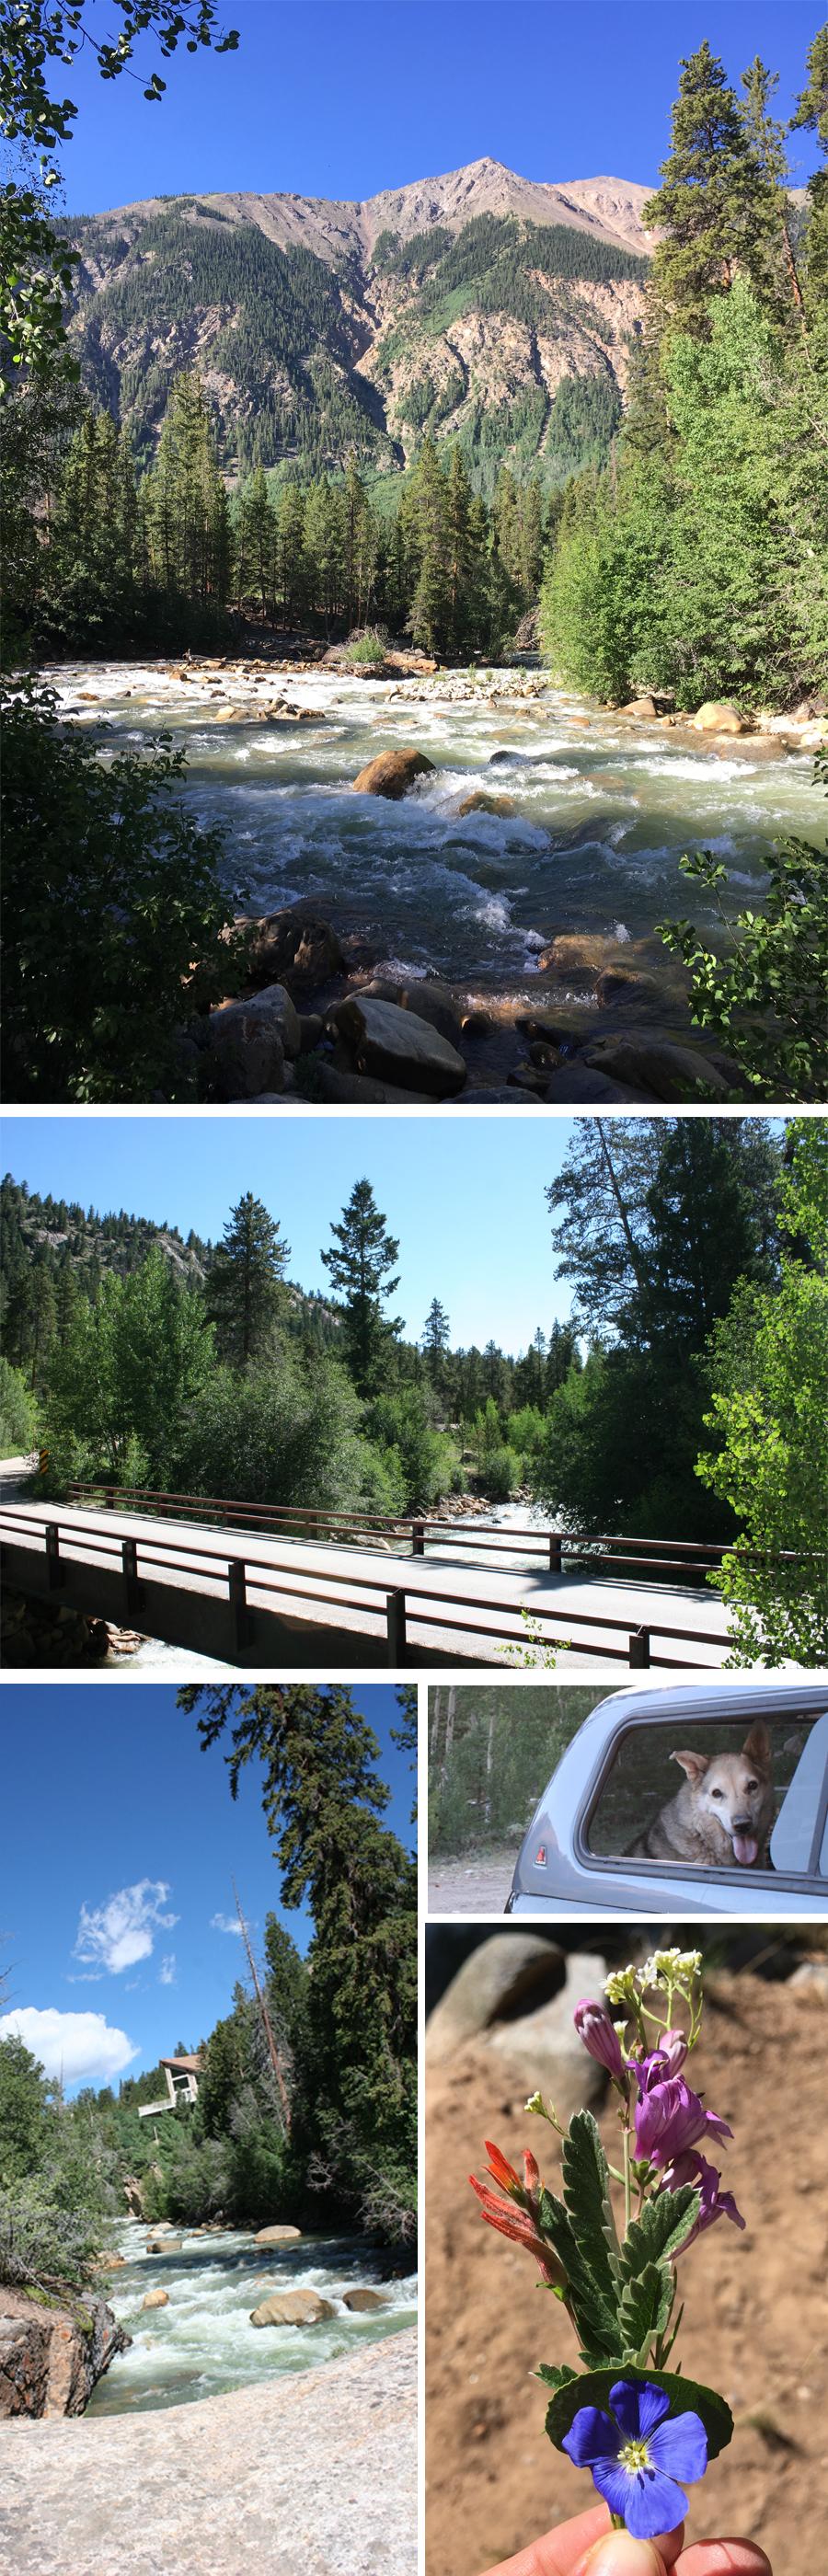 parry-peak-campground-colorado-collage